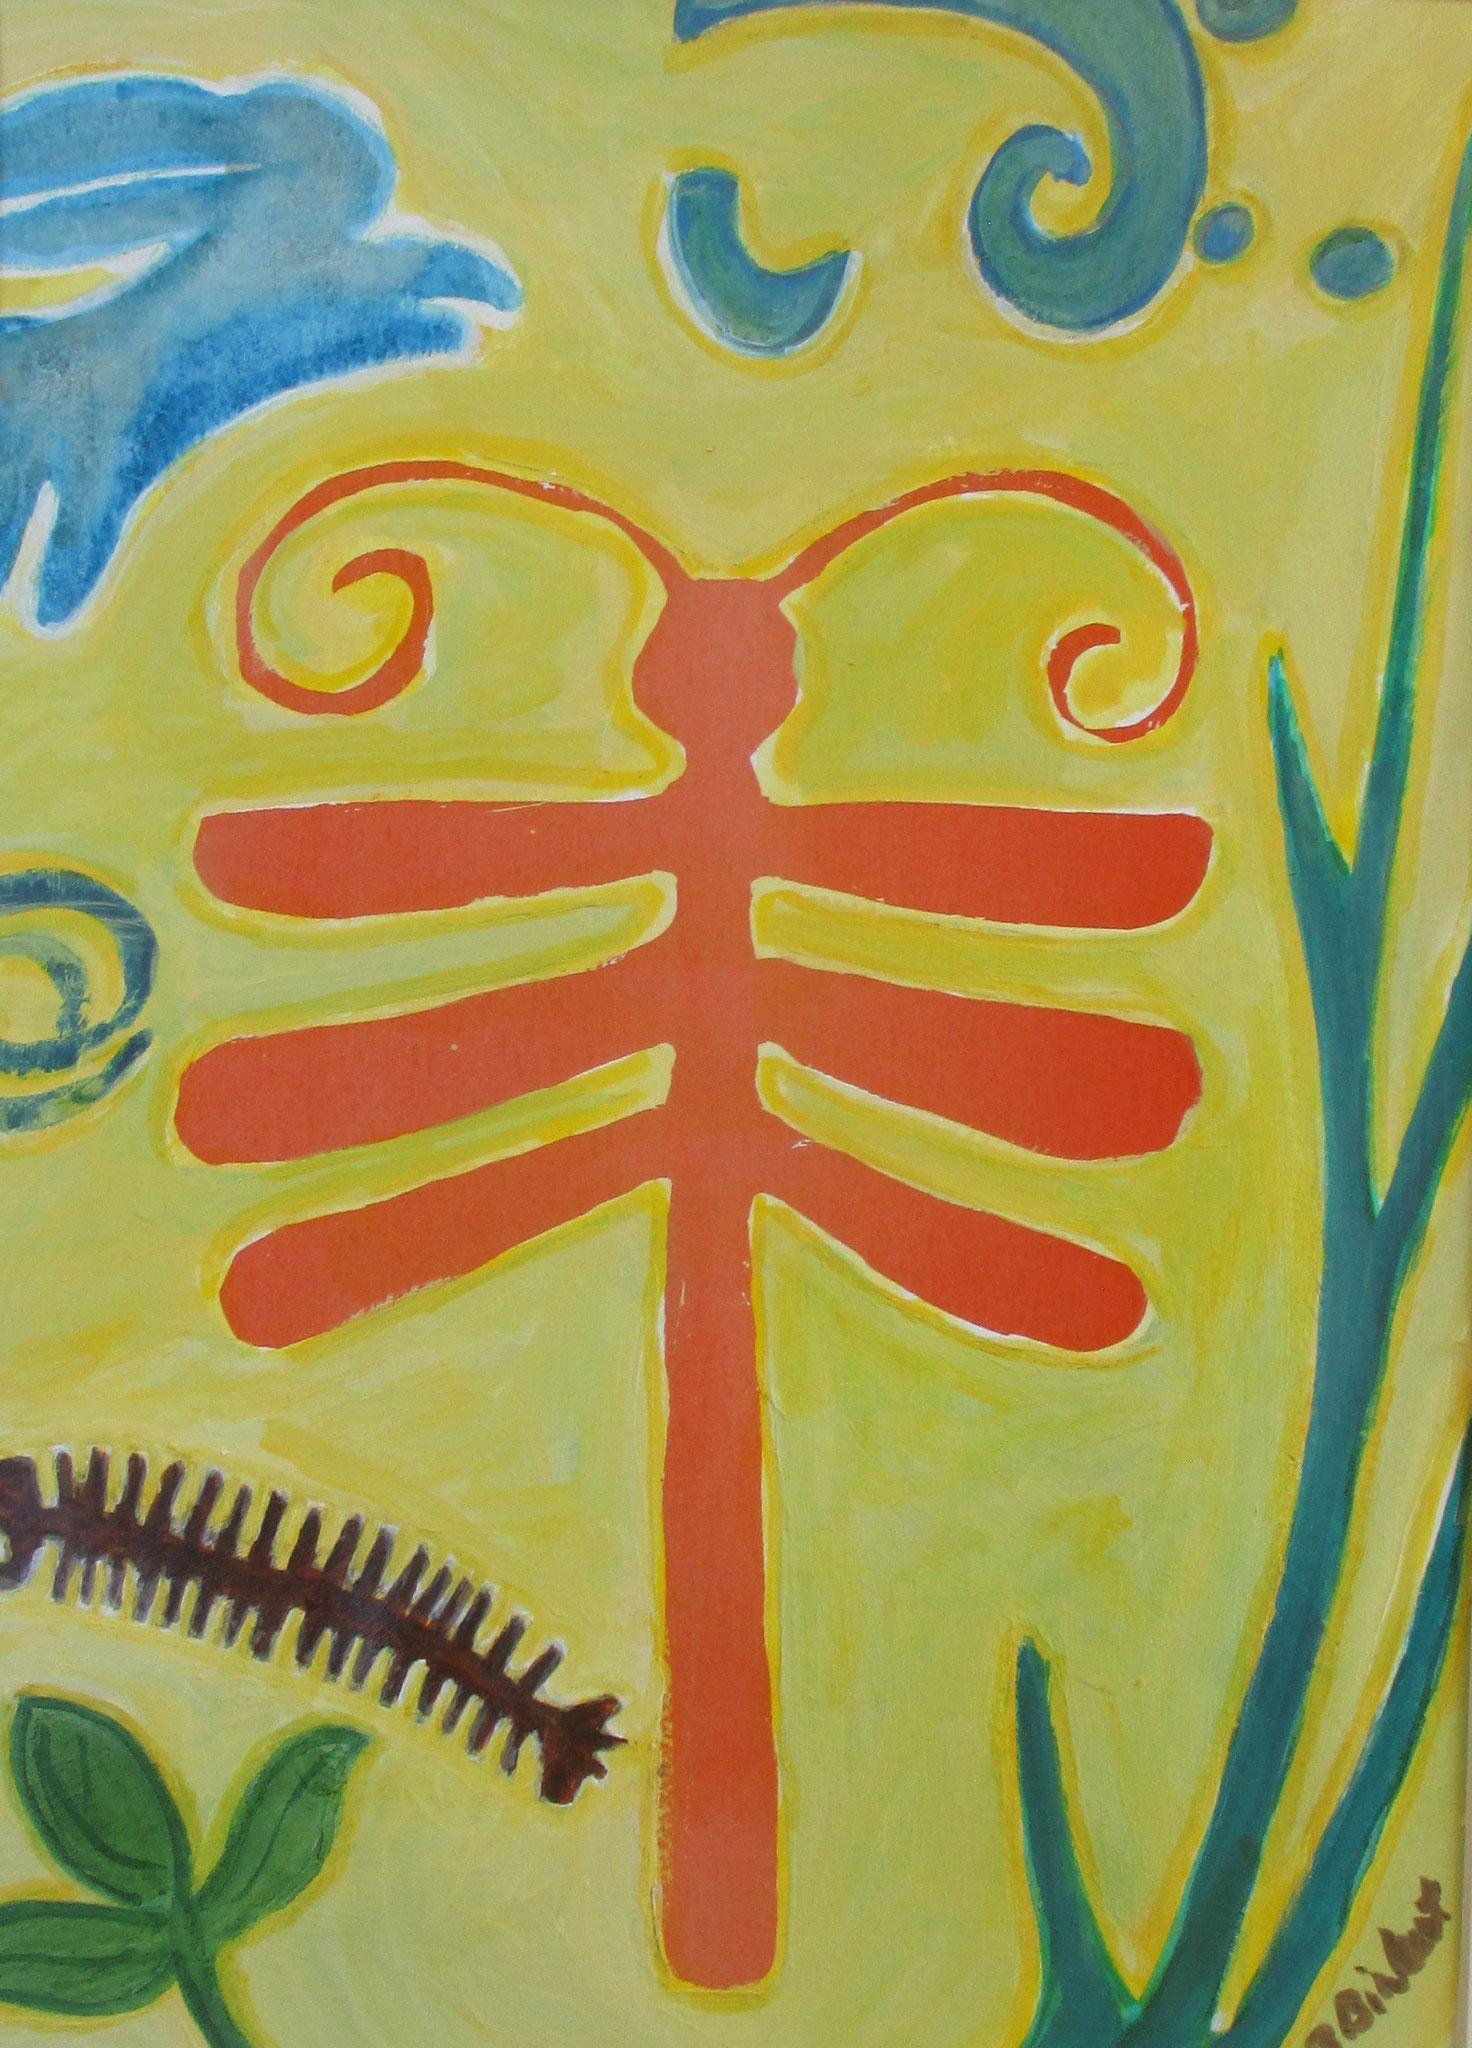 Dragonfly Garden, watercolor, 16 x 20